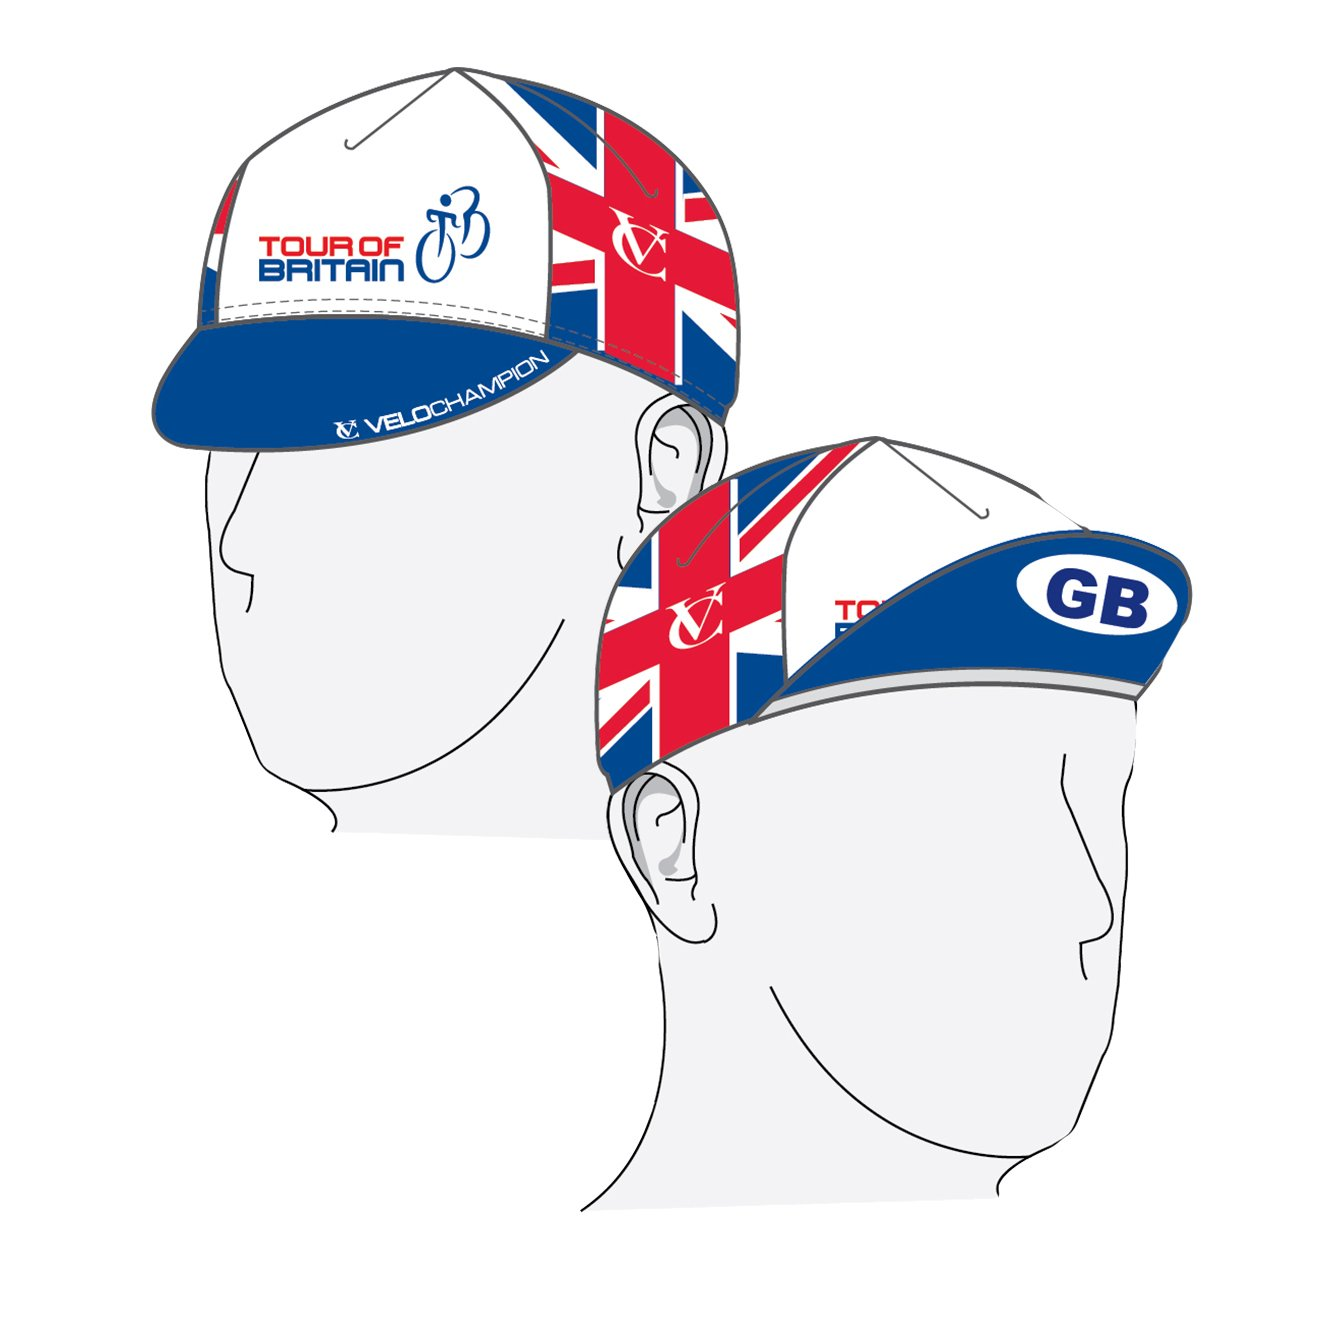 41211c530ed VeloChampion Tour of Britain Cycling Euro Cap - Cotton Cycling Hat   Amazon.co.uk  Sports   Outdoors